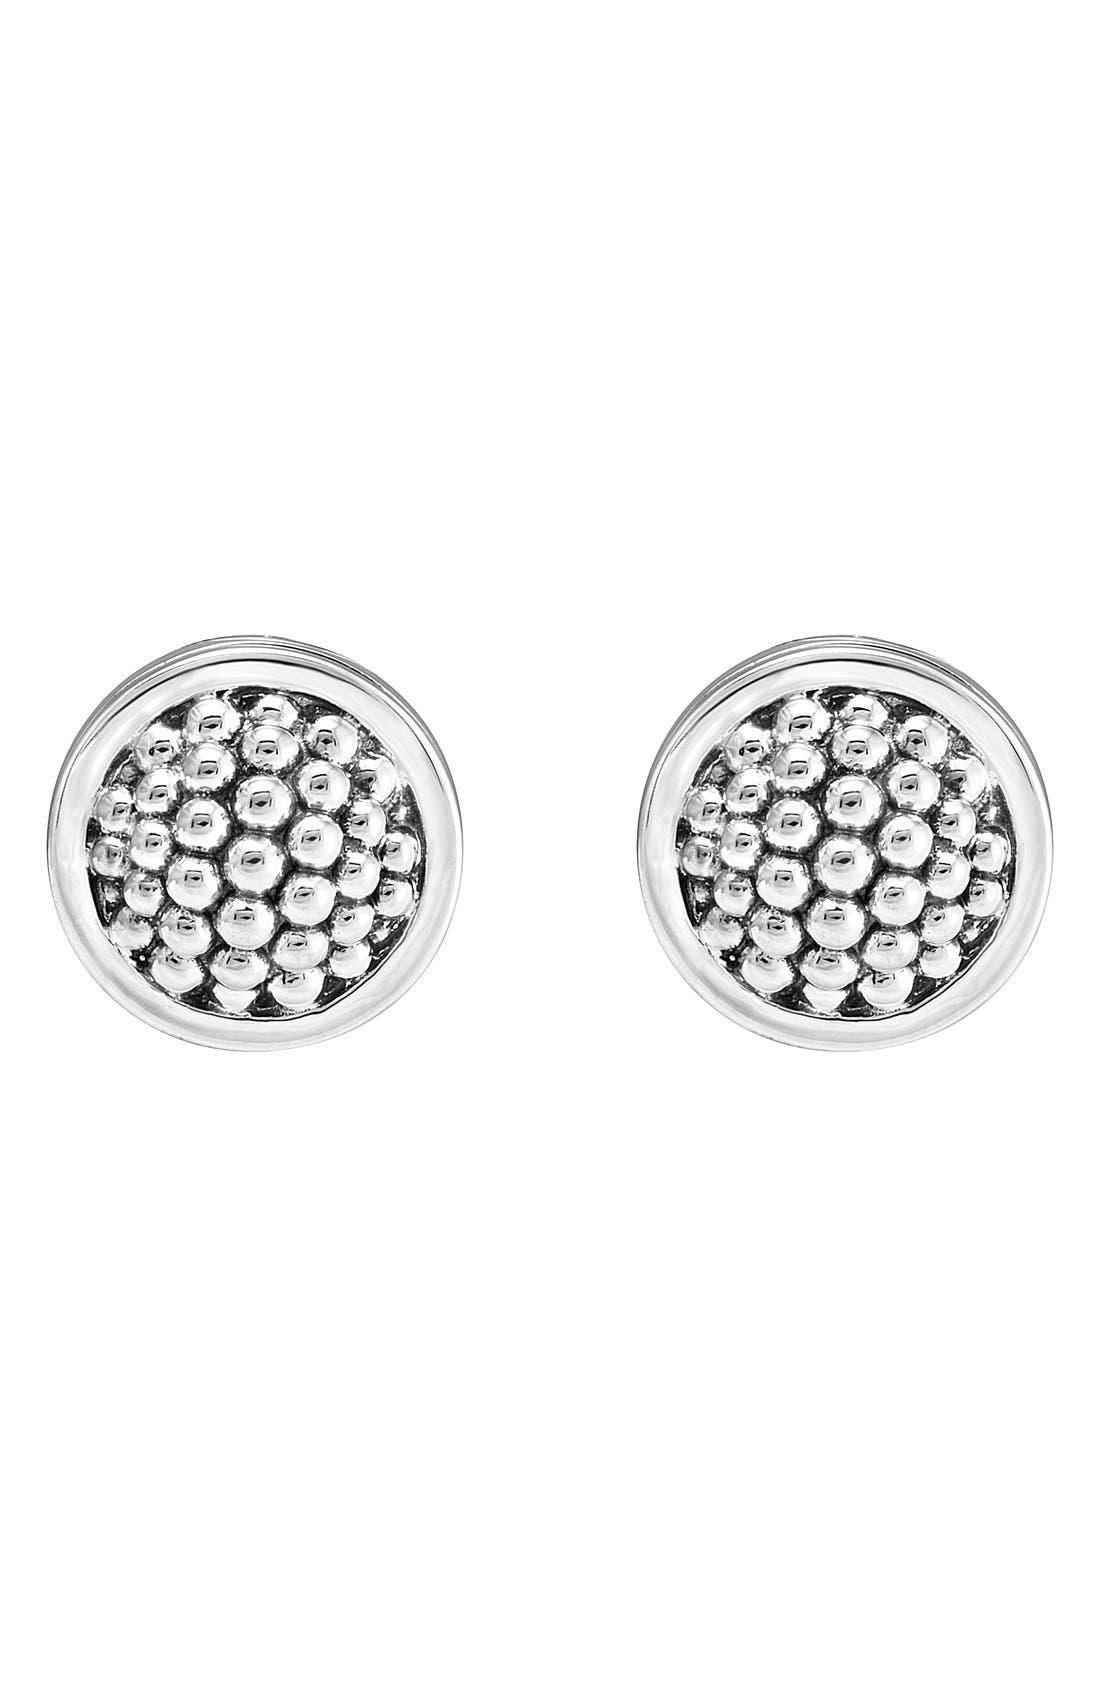 Caviar Stud Earrings,                             Alternate thumbnail 3, color,                             STERLING SILVER